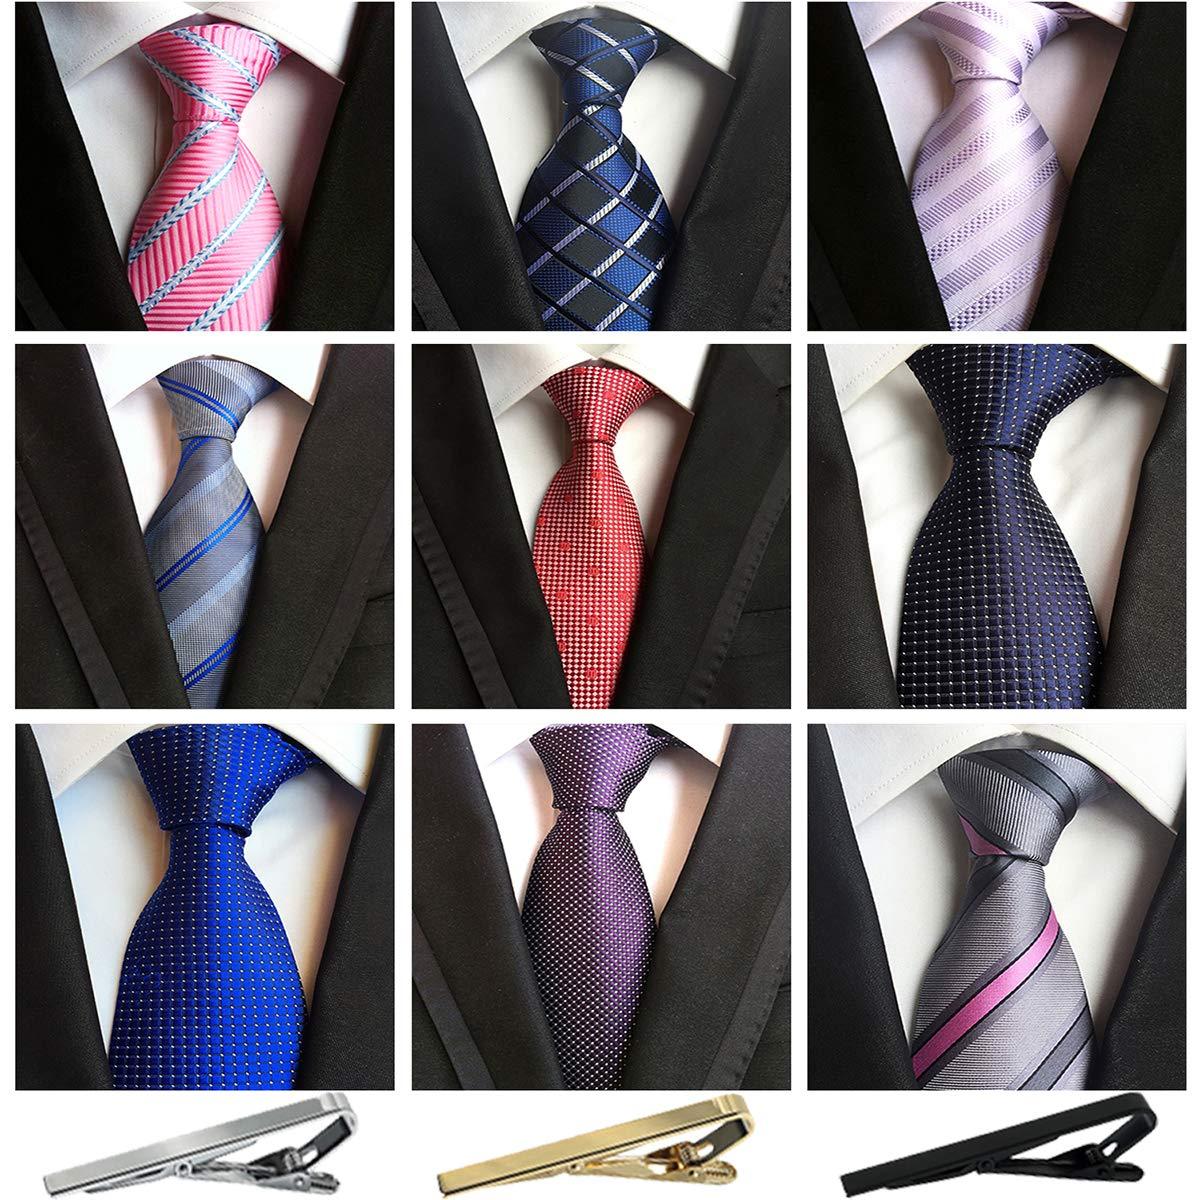 Jeatonge Lot 6pcs Mens Ties and 3pcs Tie Clips, Men's Classic Tie Necktie Woven Jacquard Neck Ties (9-8)